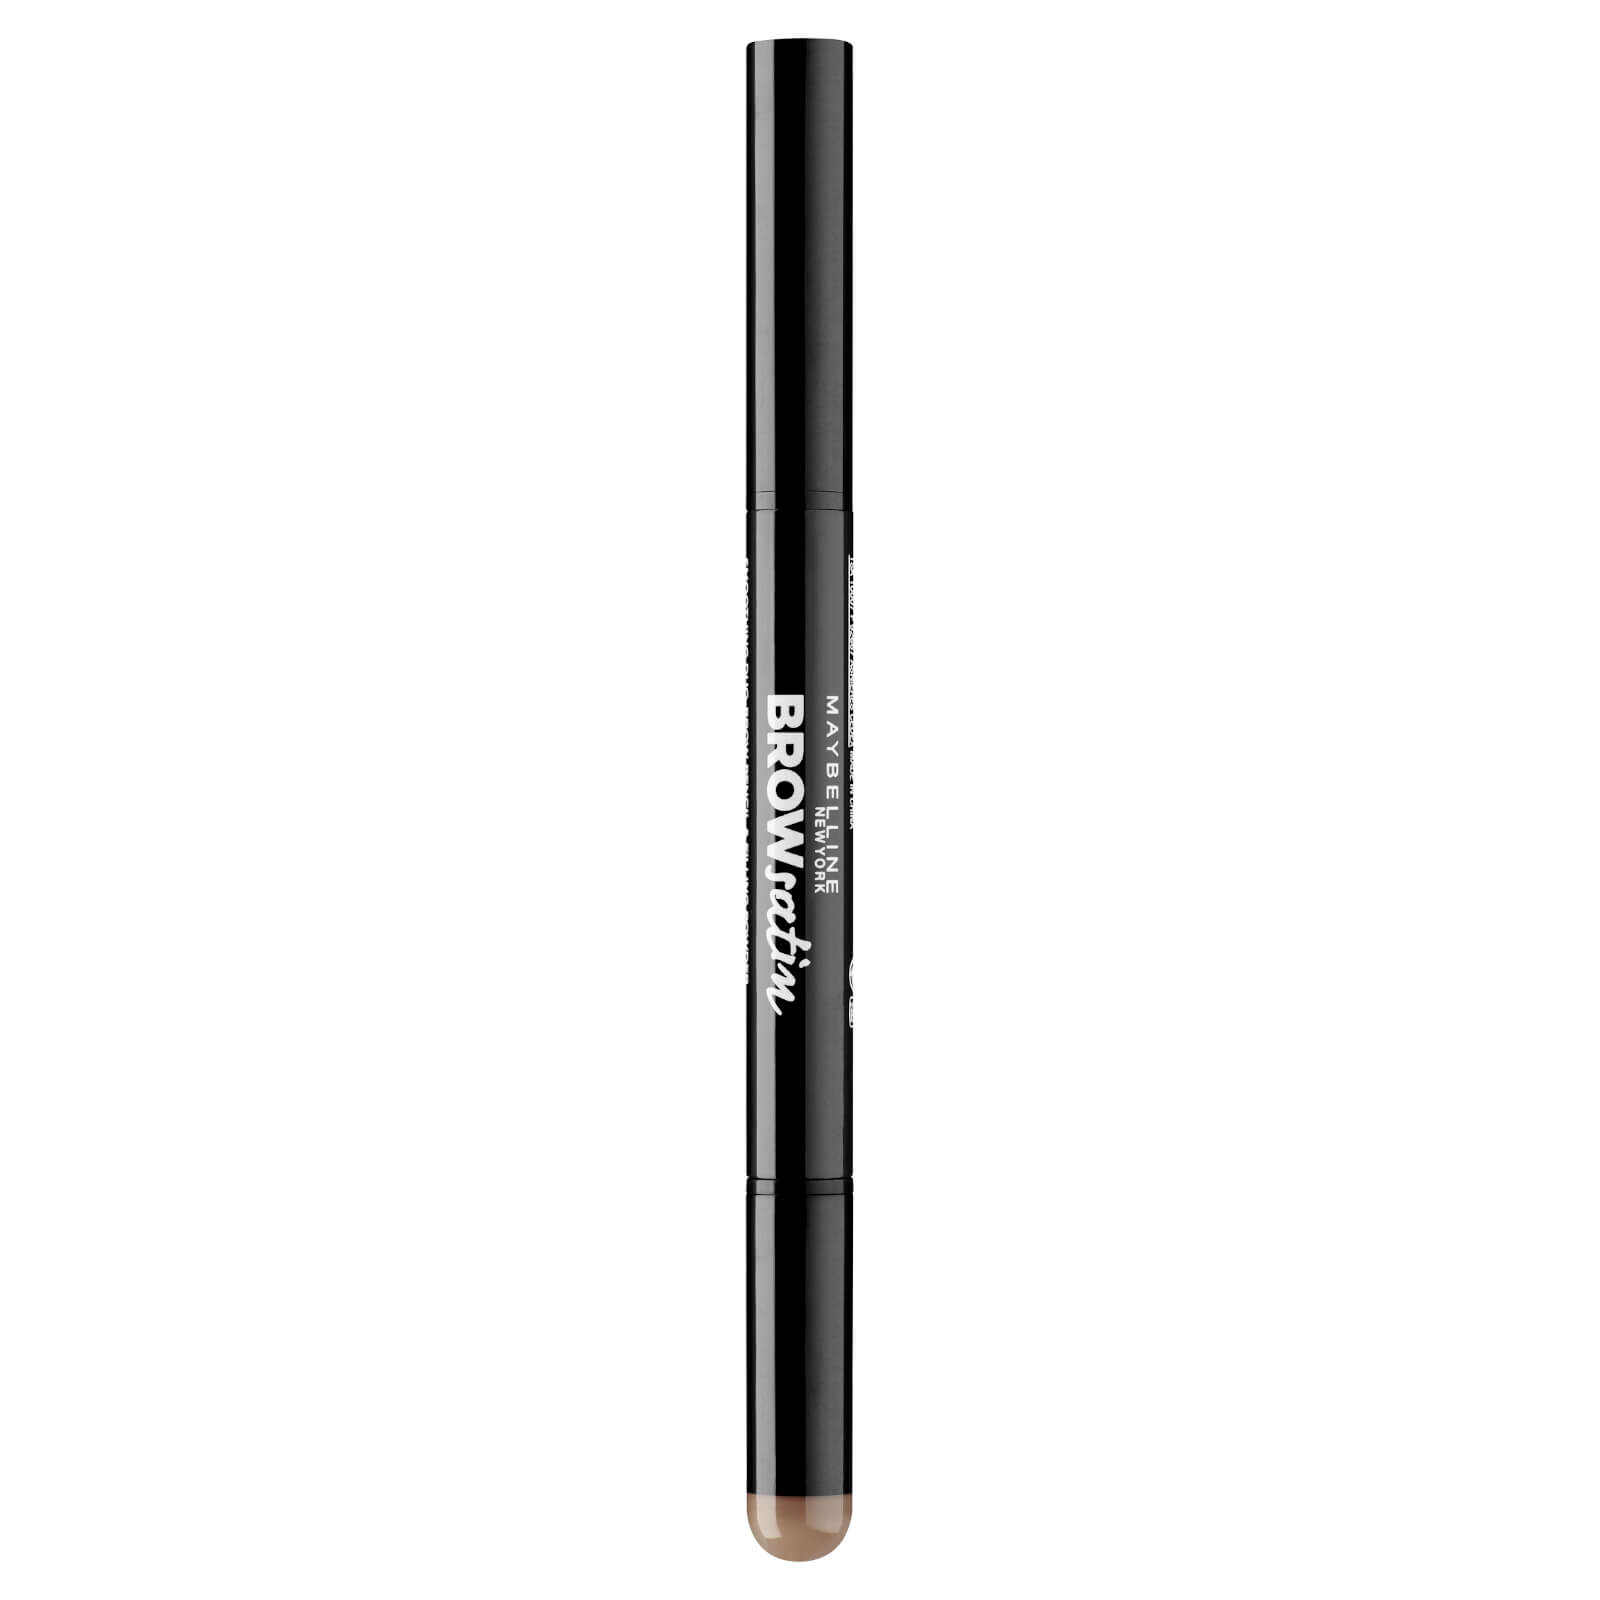 Image of Maybelline Brow Satin matita per sopracciglia (varie tonalità) - Medium Brown